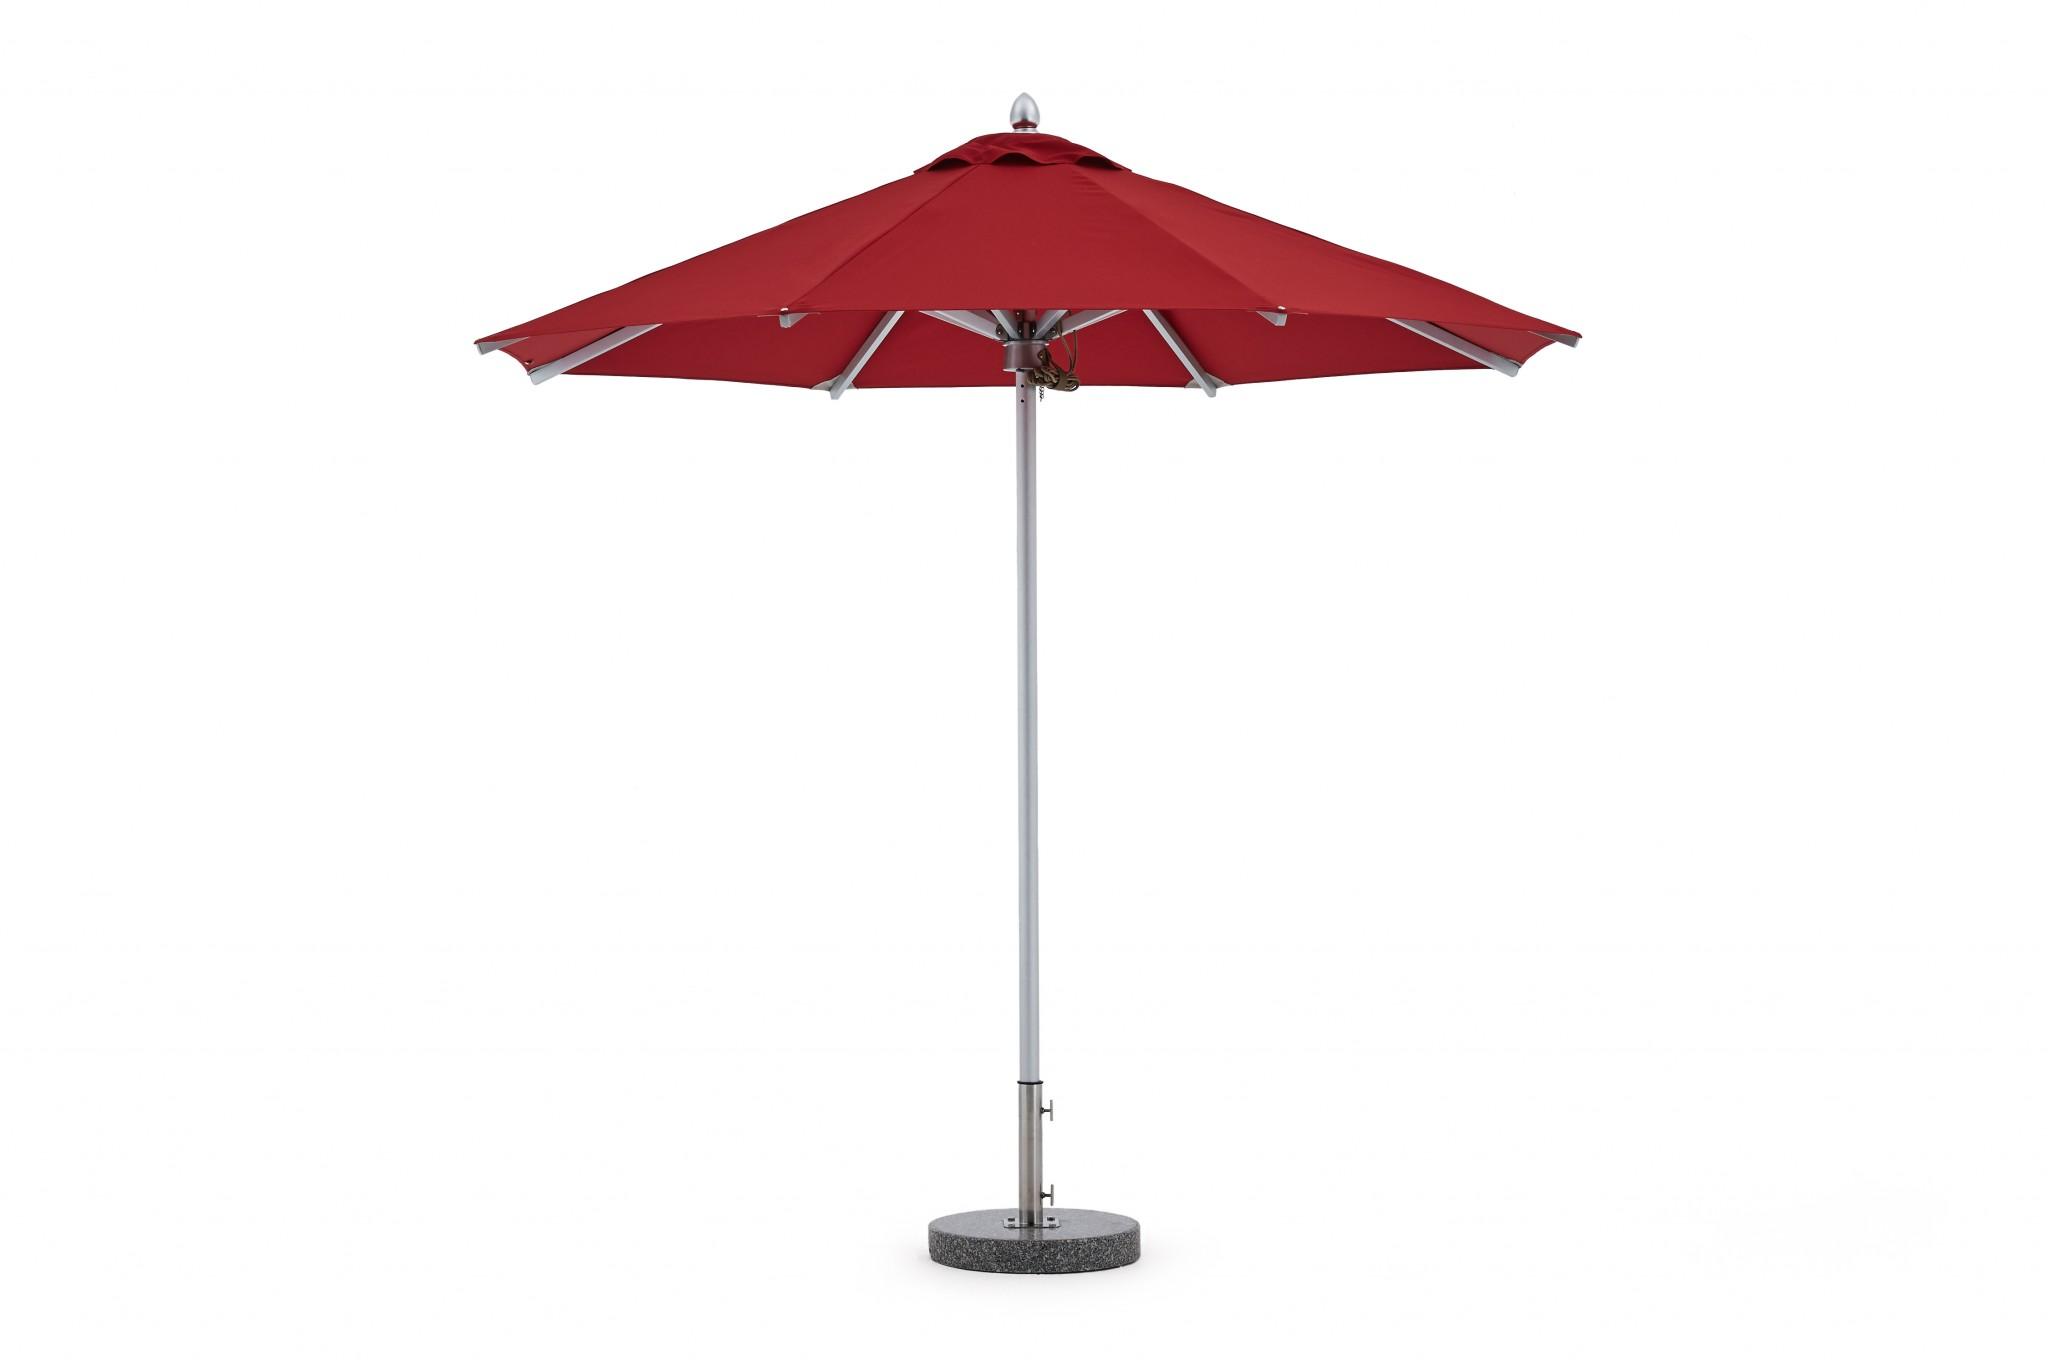 Center Pole Umbrella - Deluxe